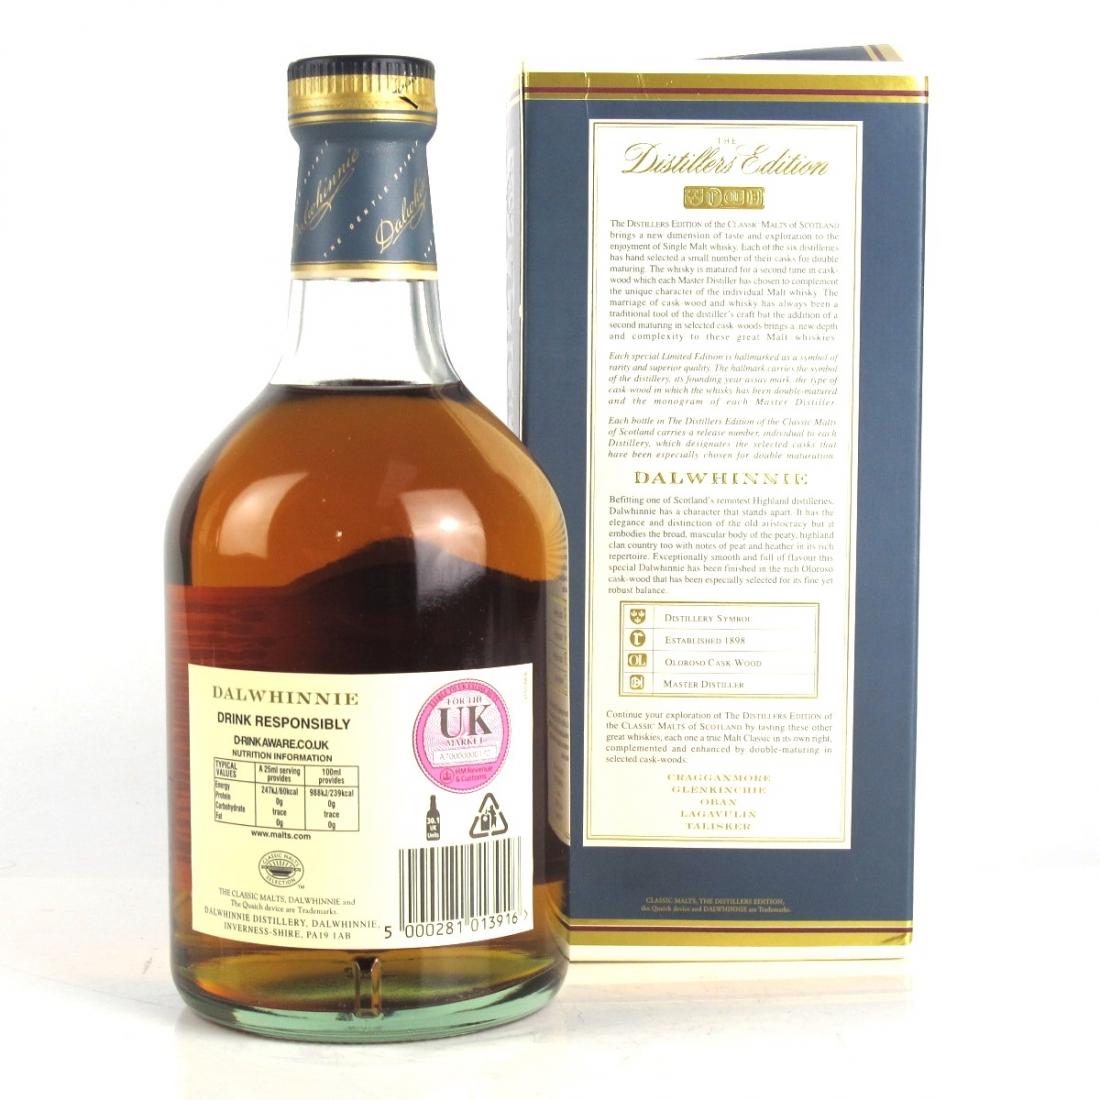 Dalwhinnie 1990 Distillers Edition 2006